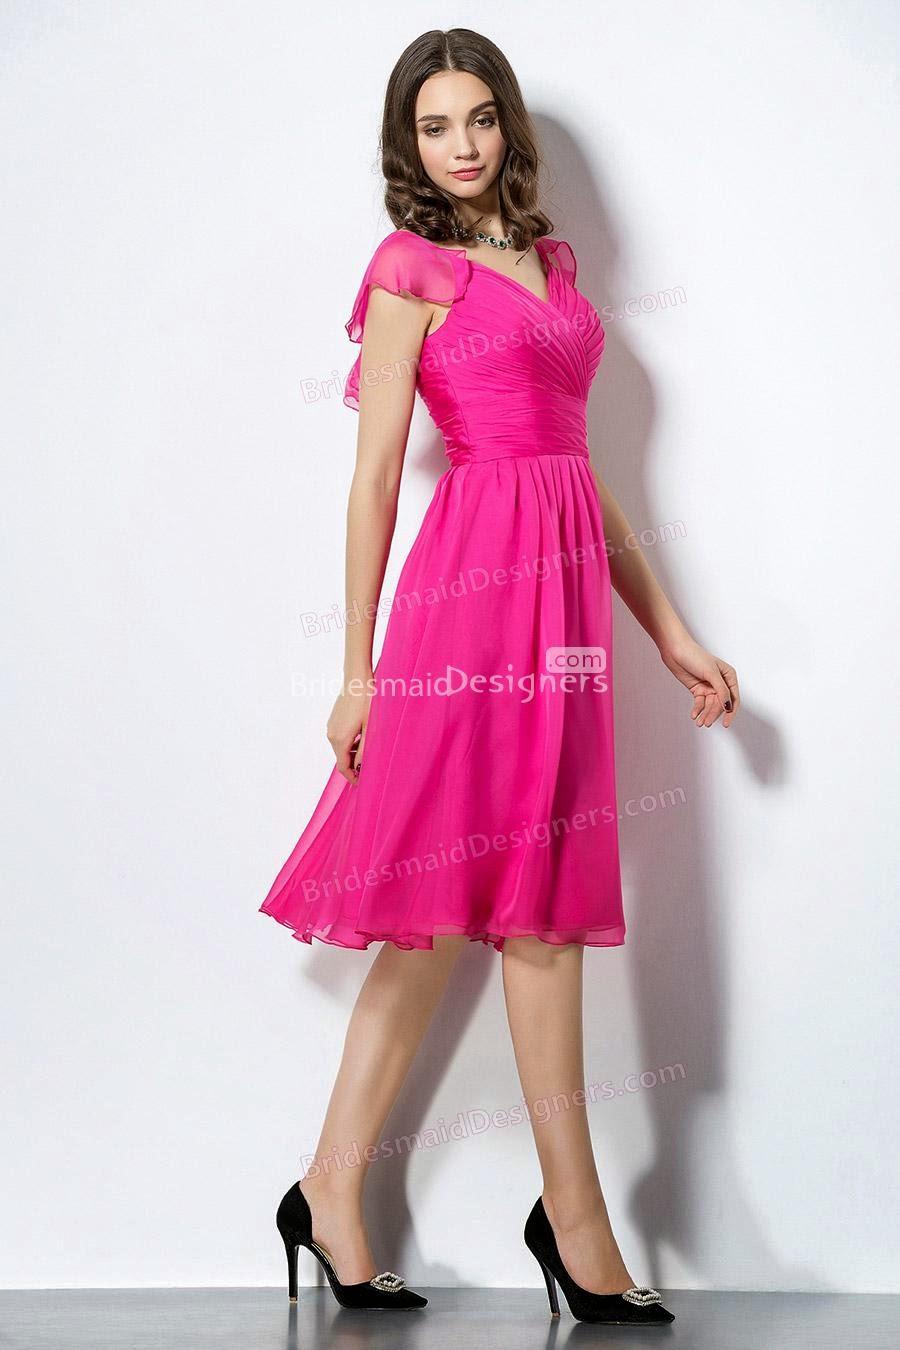 Fuschia Bridesmaid Dresses To Make You Feel Beautiful ...